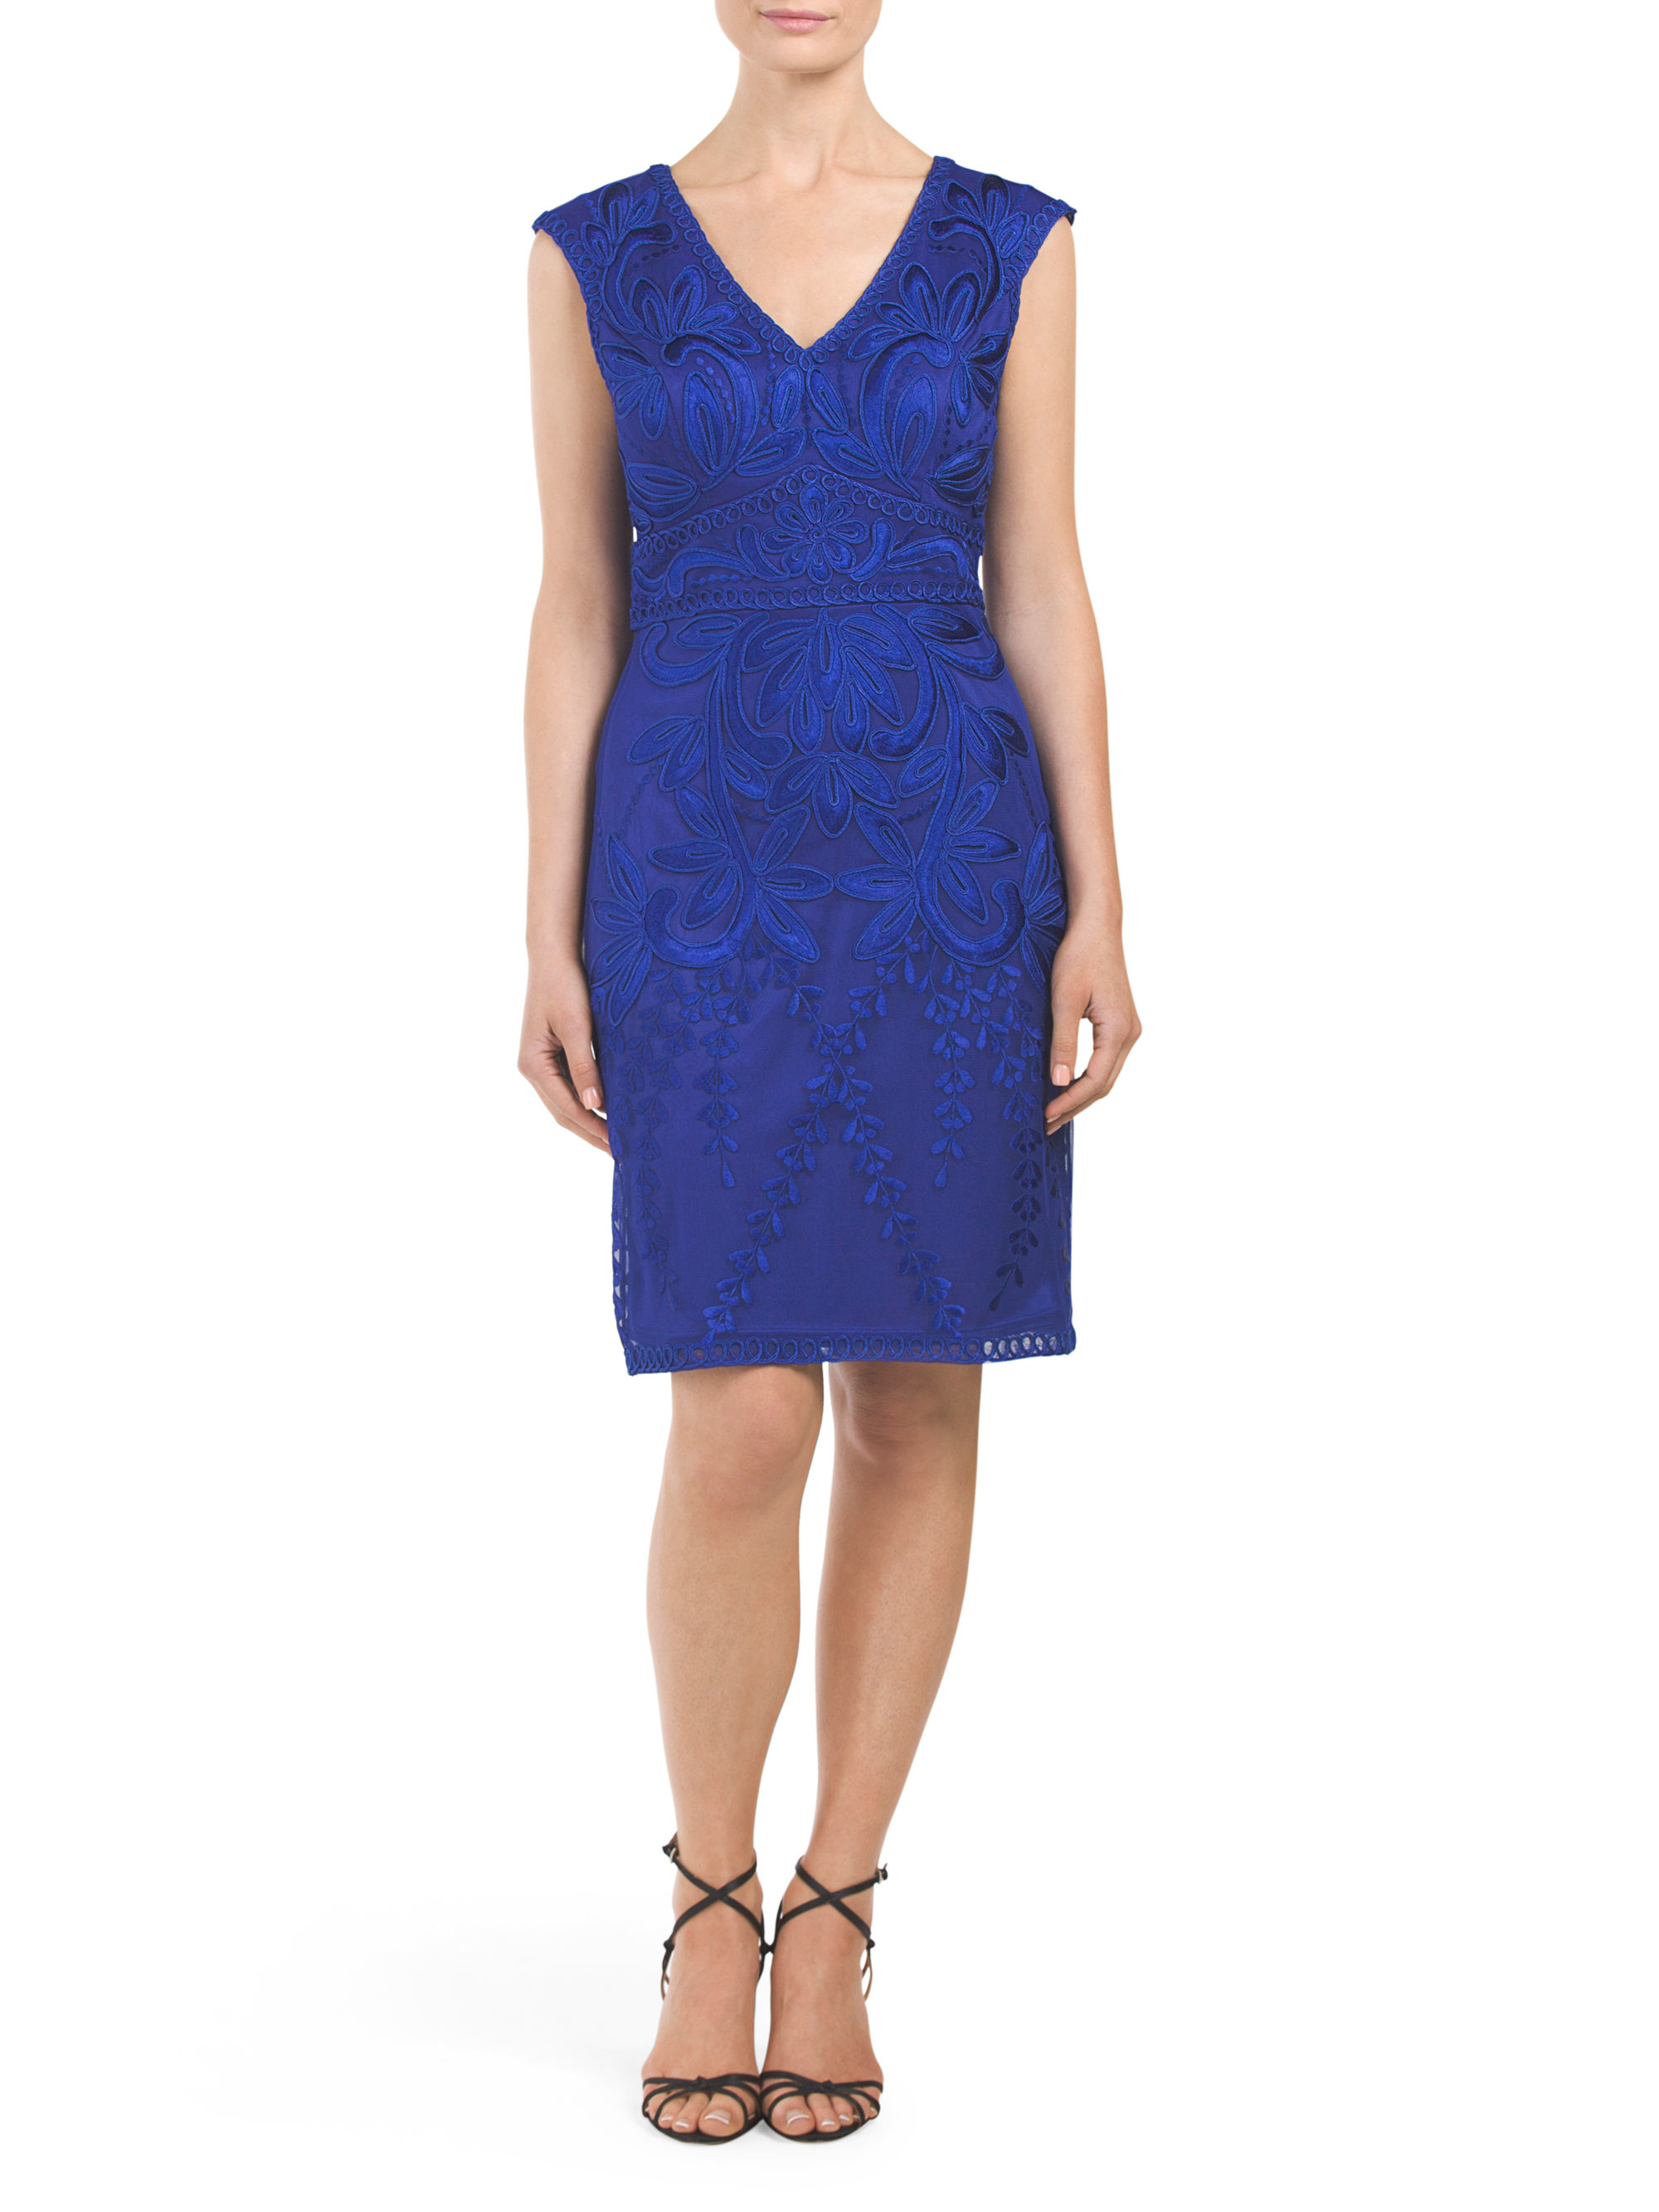 Tj maxx v neck soutache dress in blue lyst for Tj maxx t shirts